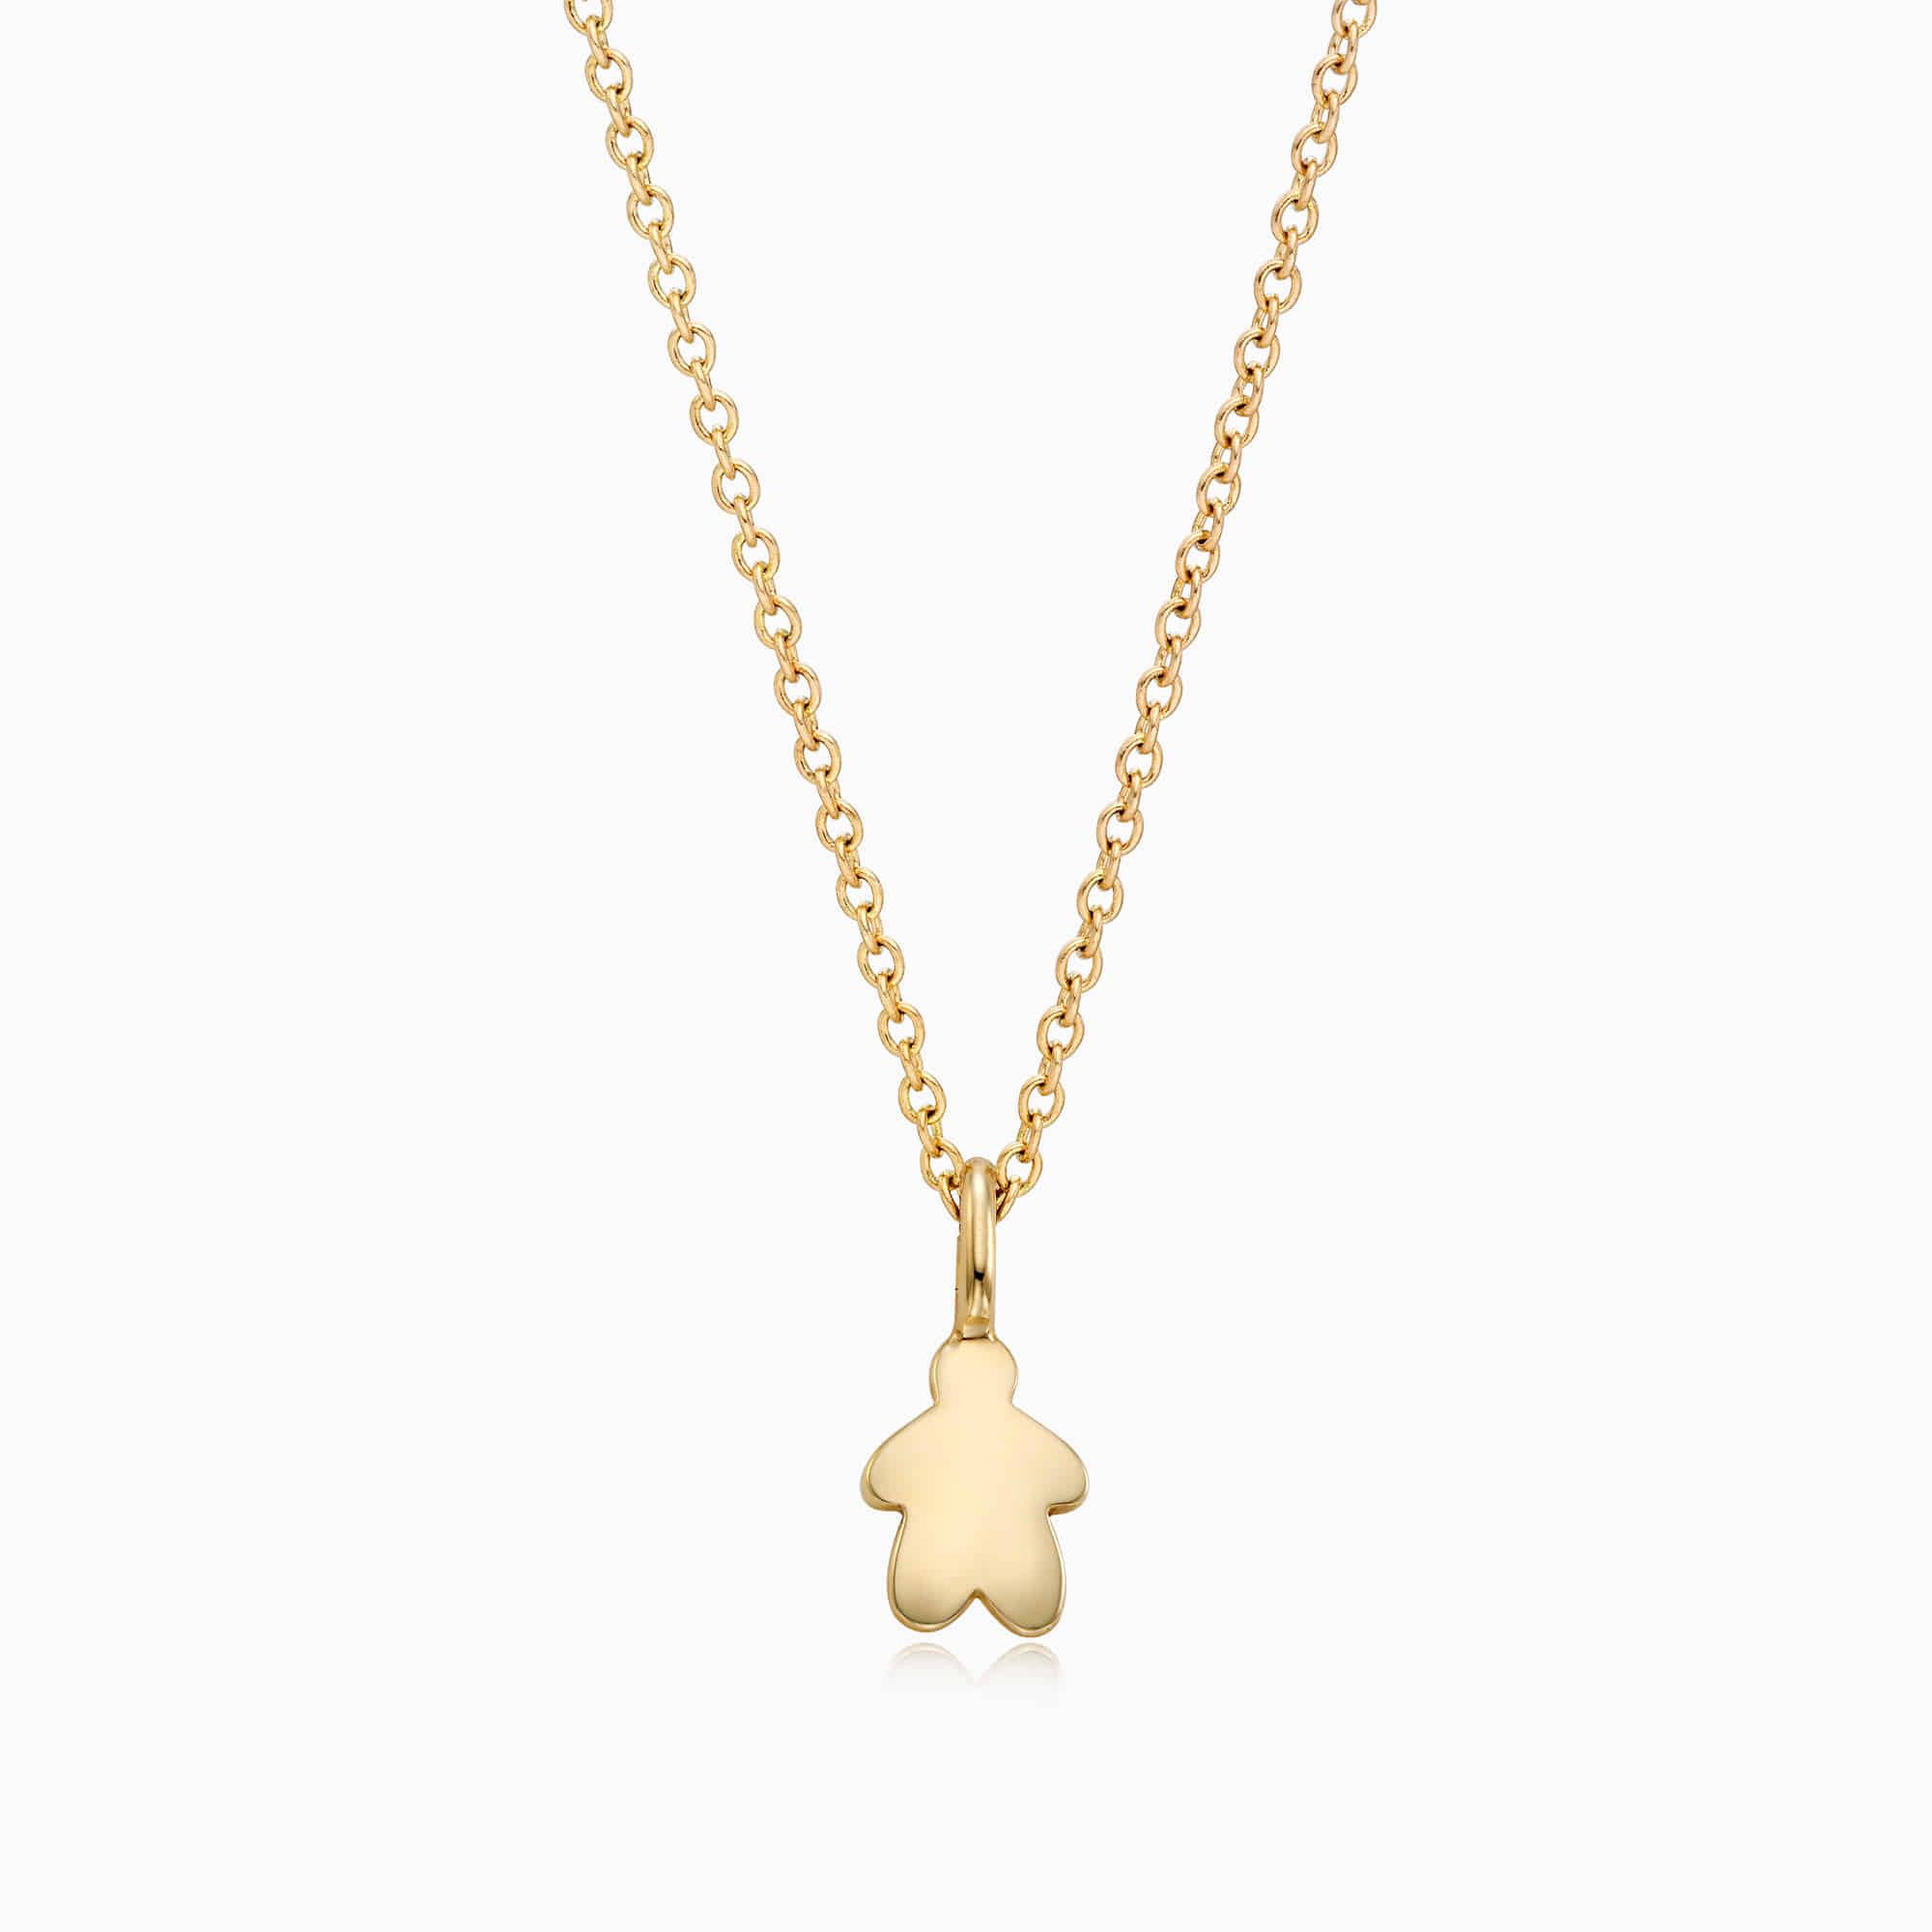 14K/18k Gold Kaiu Hope Necklace - me Necklace